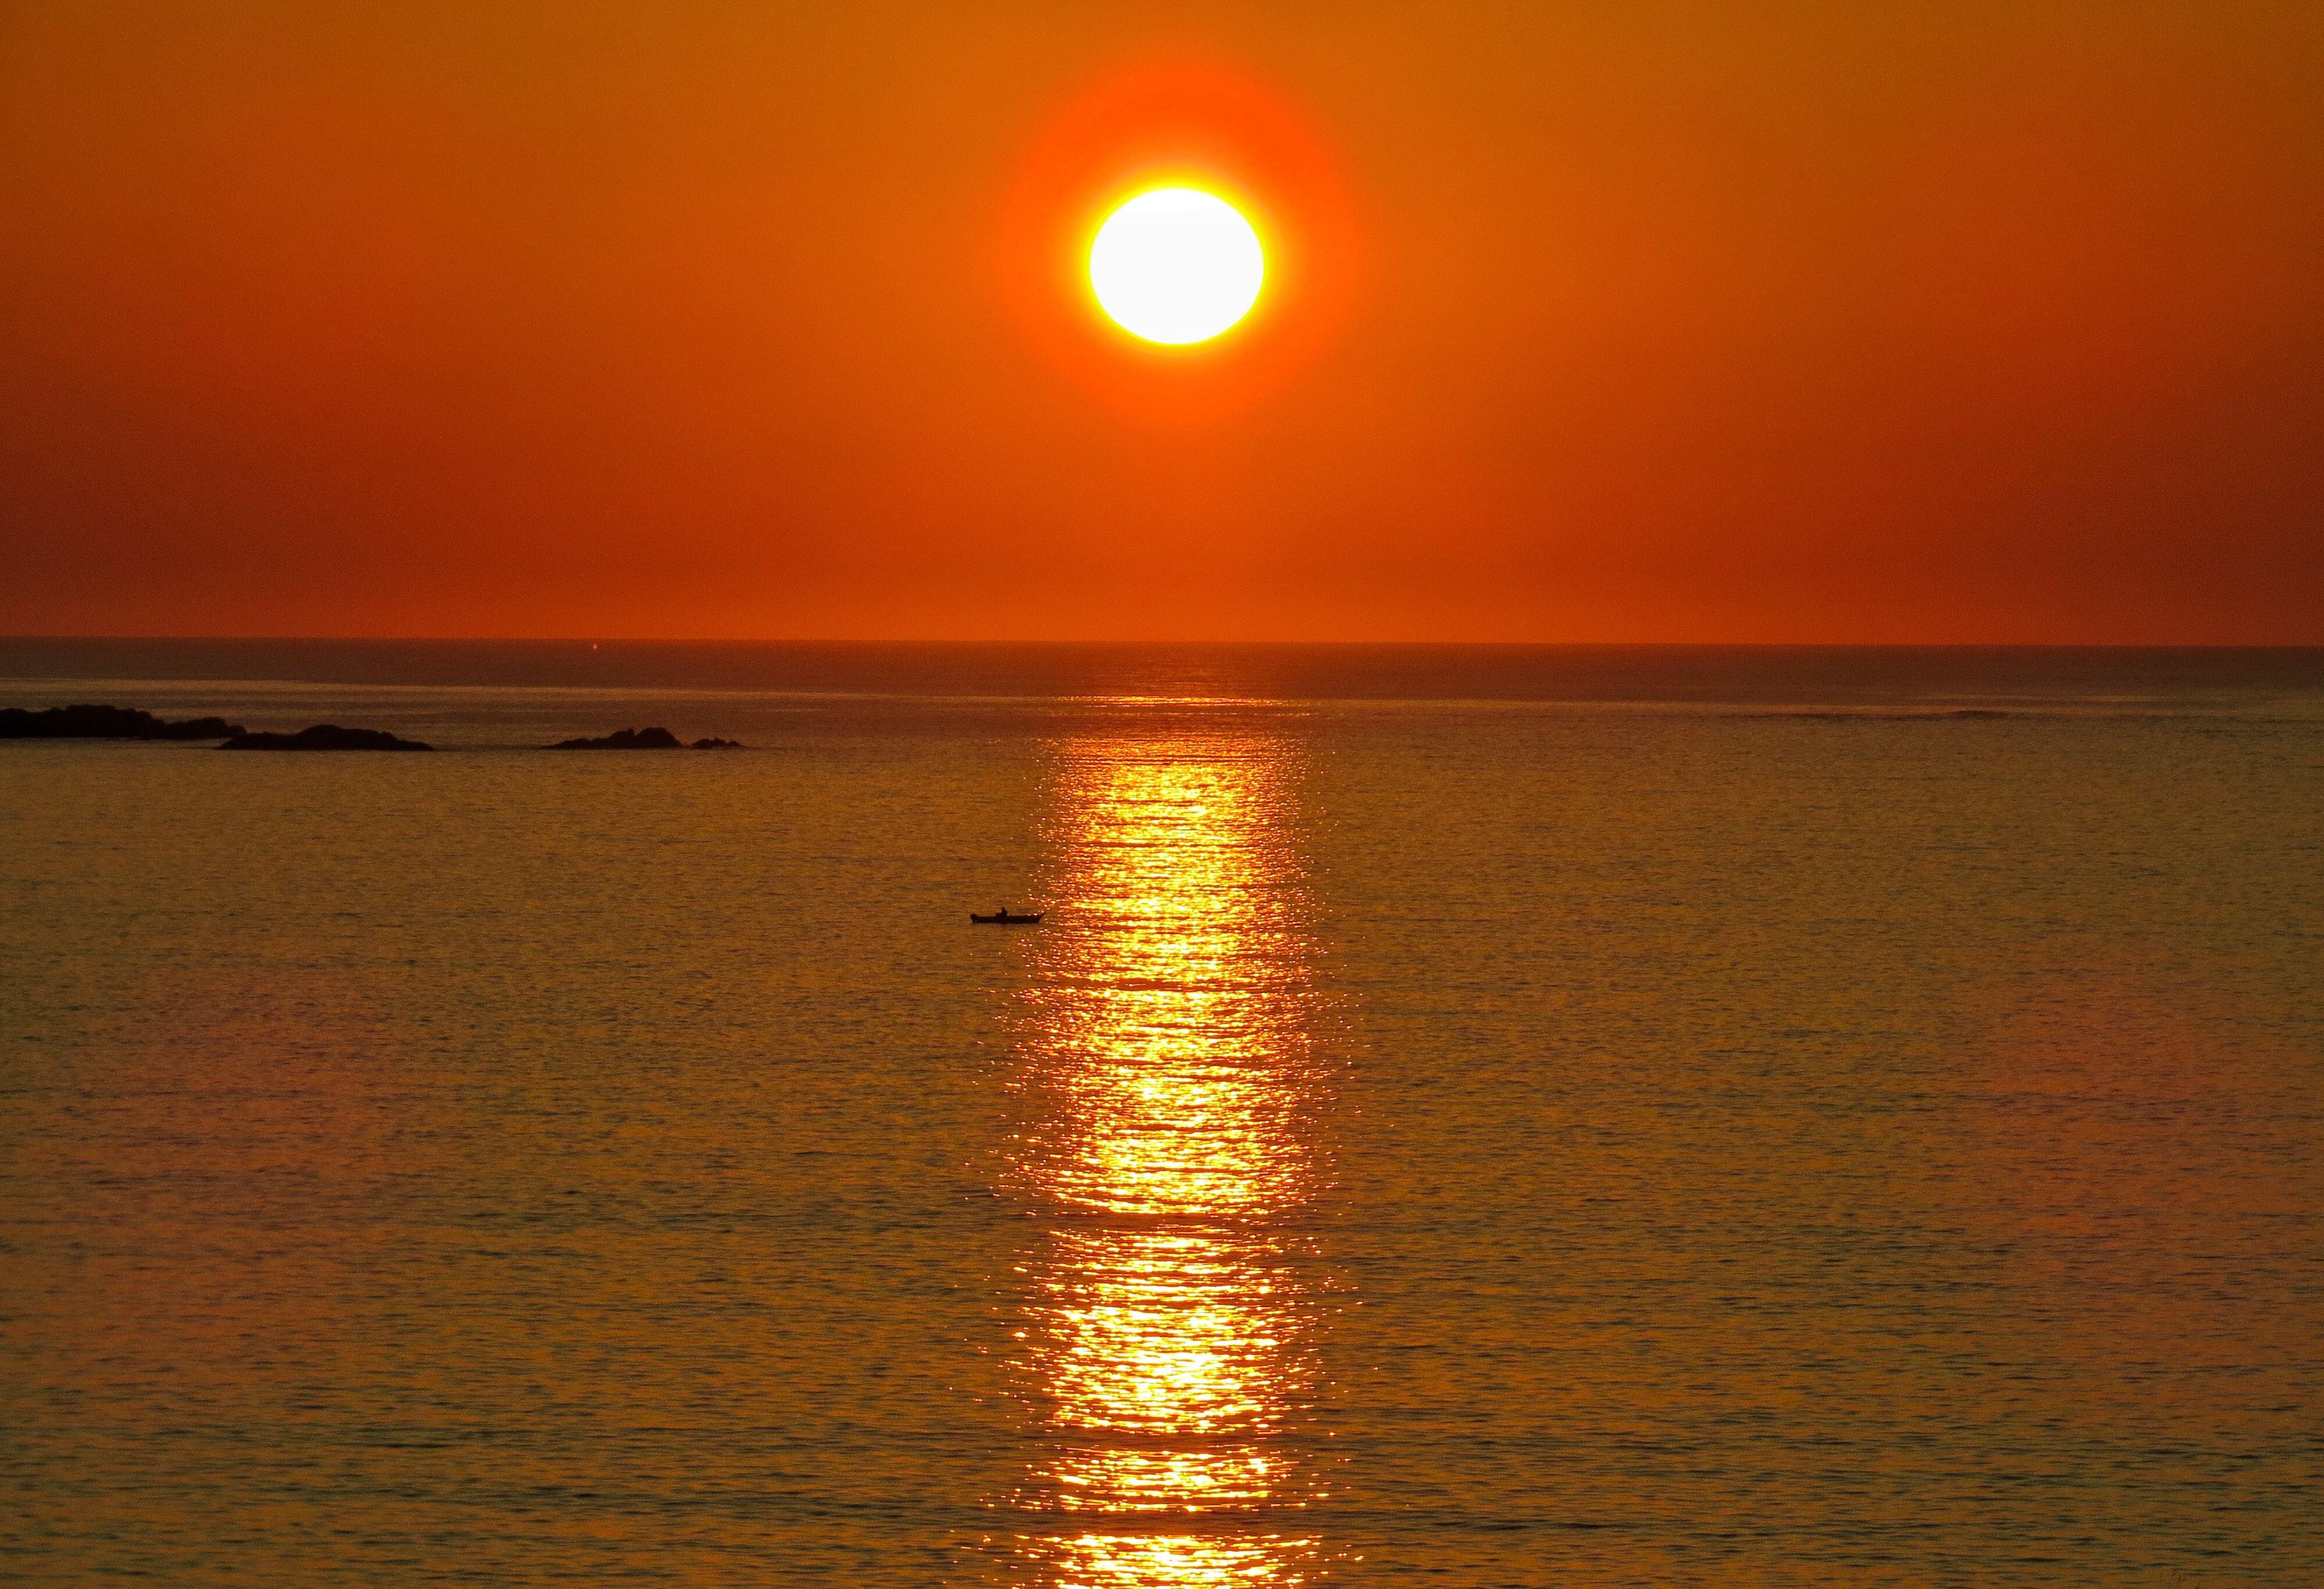 Seasafari Øksnes, Seasafari Øksnes - Midnight sun safari